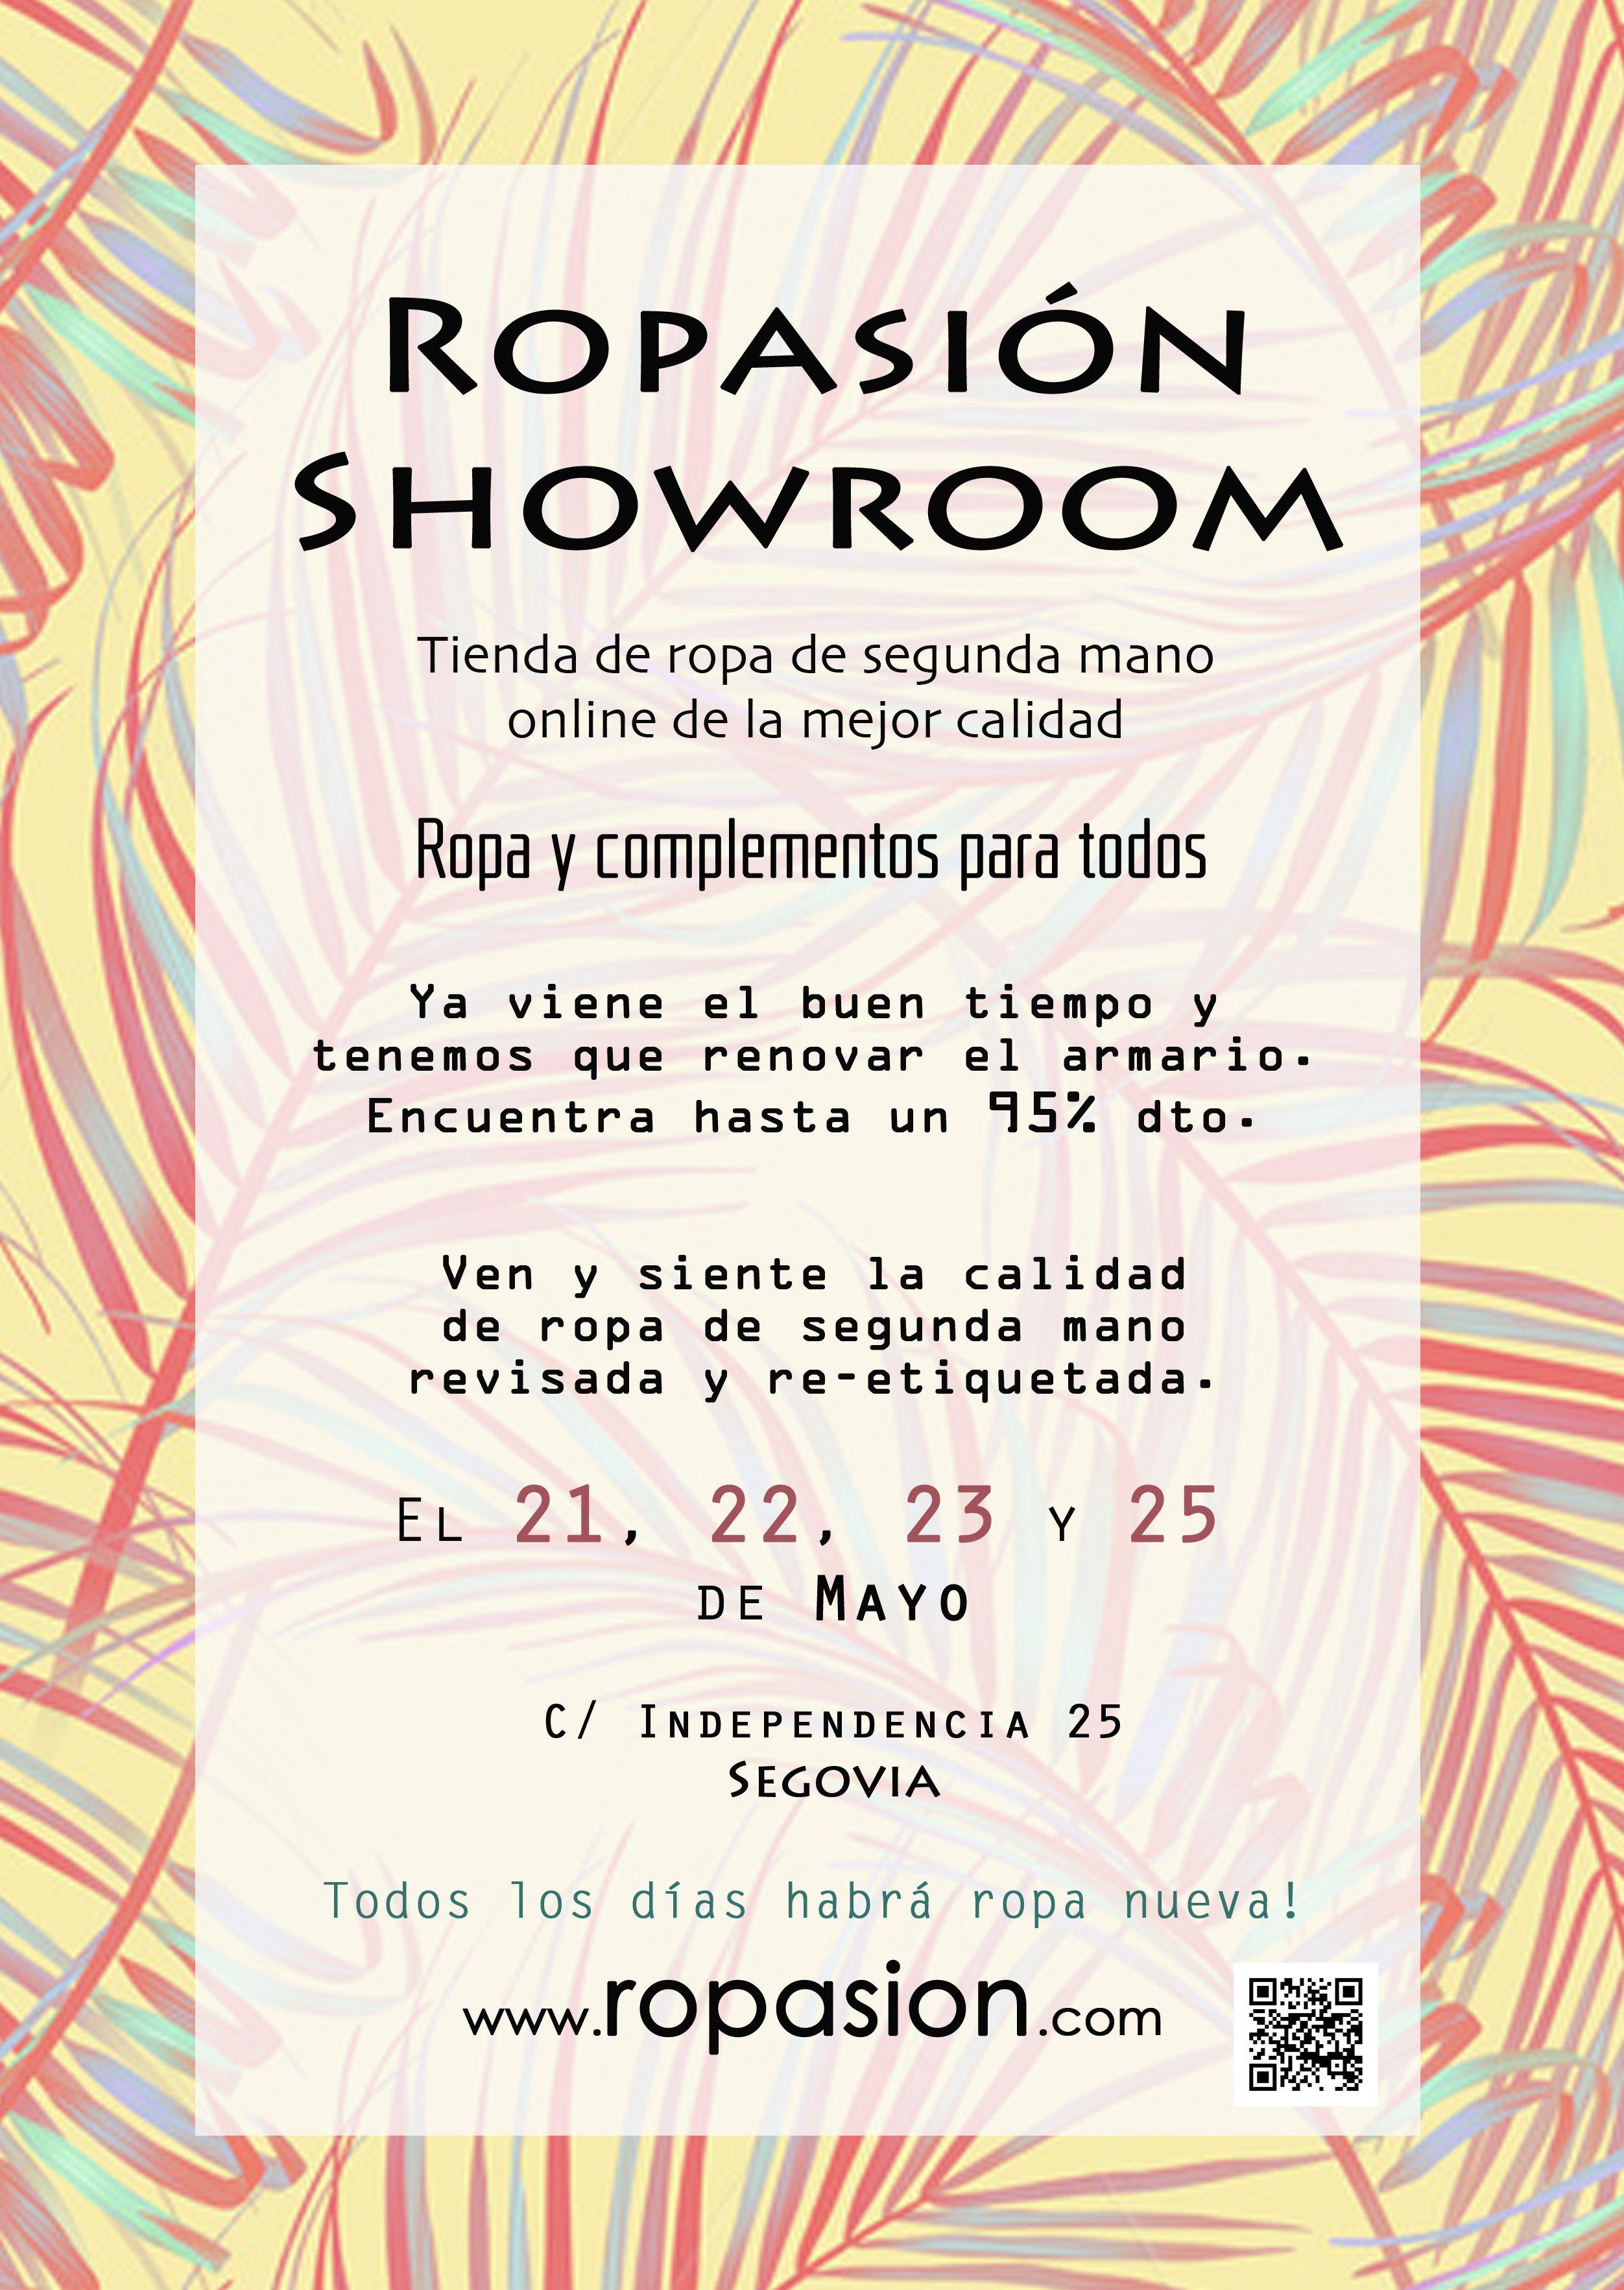 Ropasion Tienda Ropa Segunda Mano Online Calidad Shopping Visual Merchandising Women